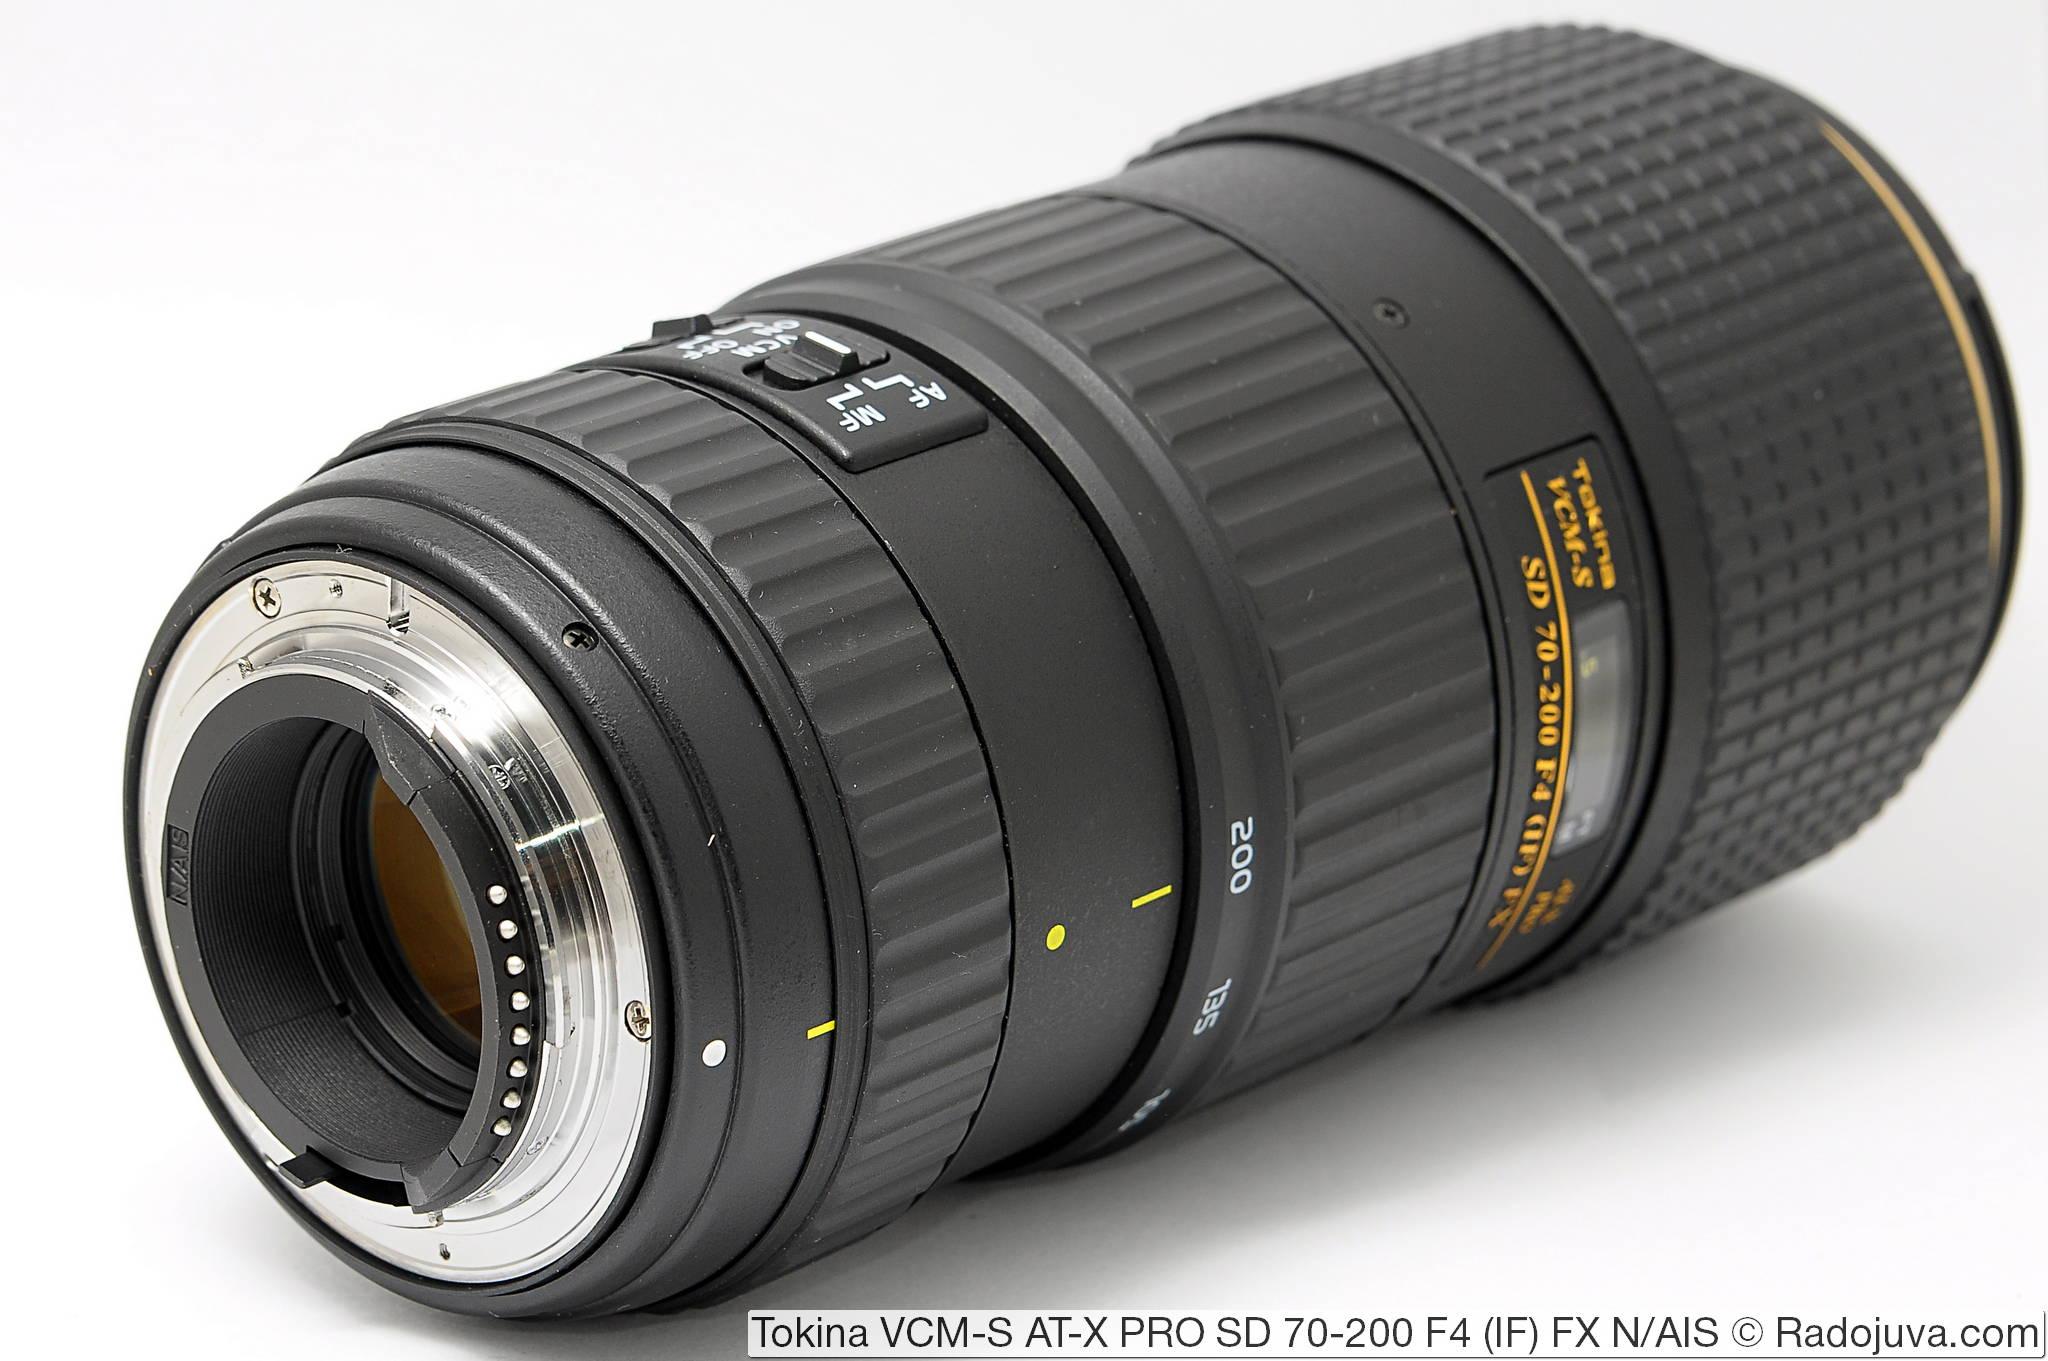 Tokina VCM-S AT-X PRO SD 70-200 F4 (IF) FX